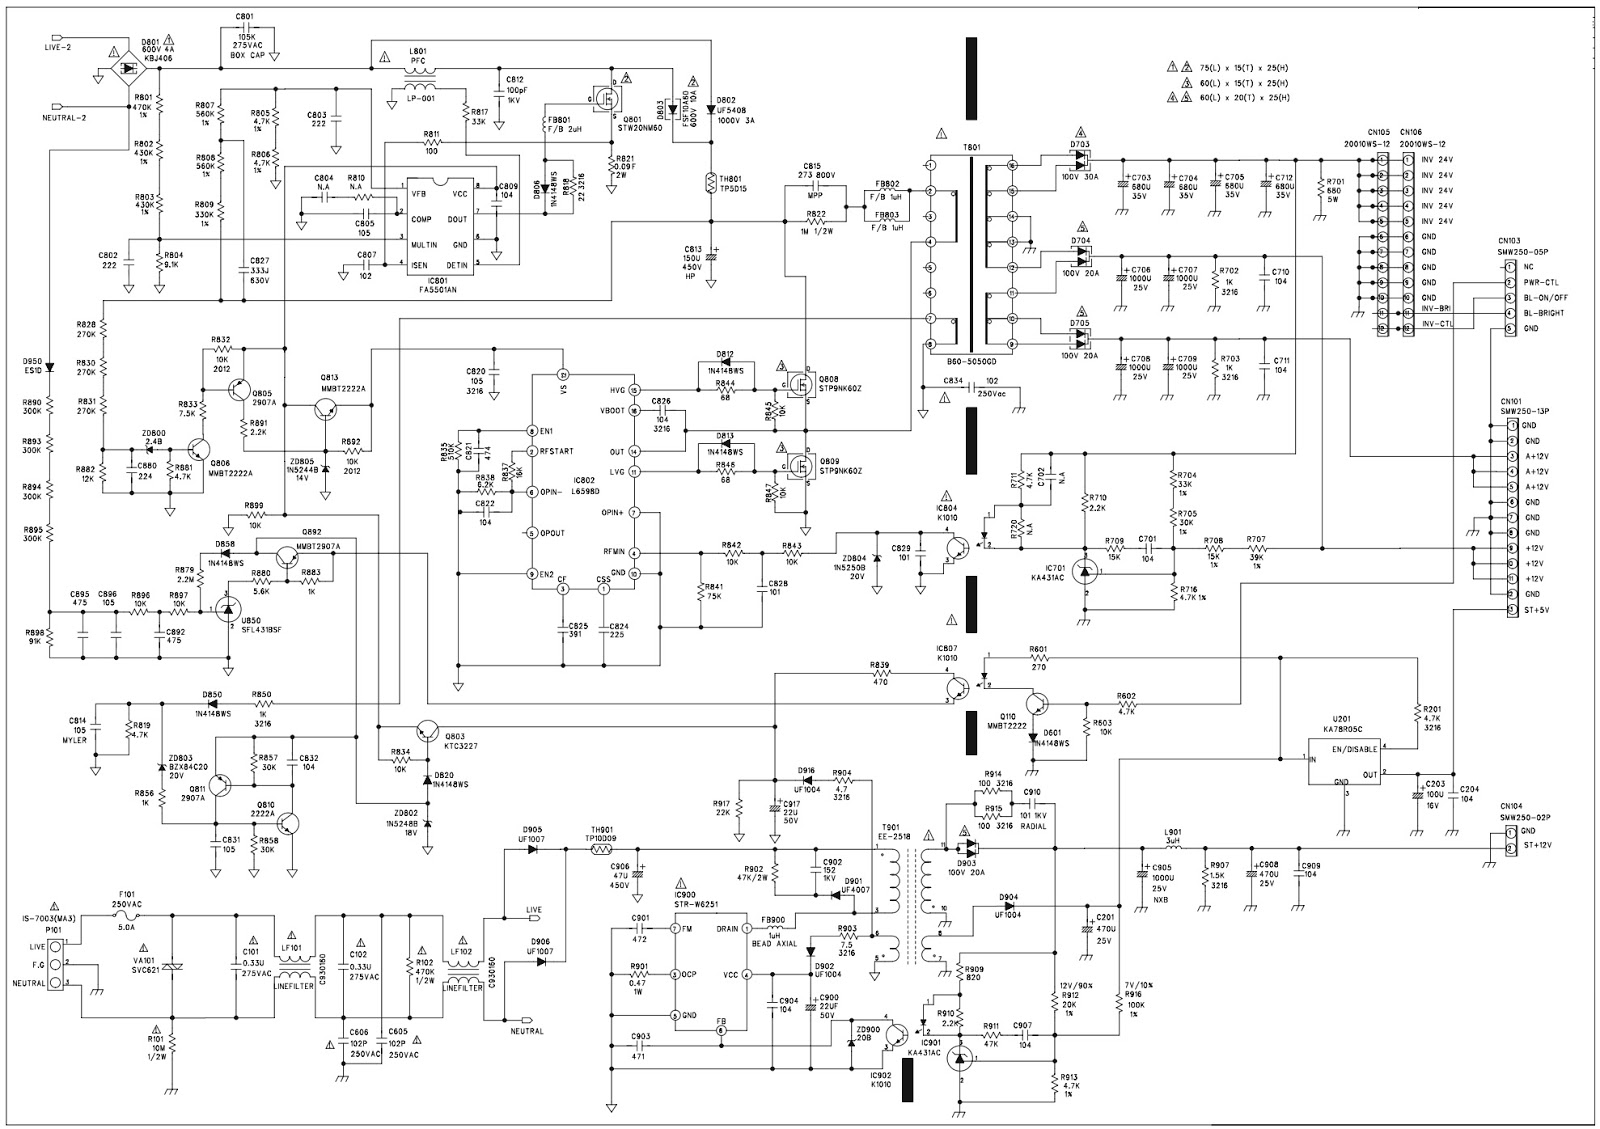 lg tv schematic diagrams wiring diagram compilationlcd tv schematic diagrams wiring diagram toolbox lg television schematic [ 1600 x 1129 Pixel ]